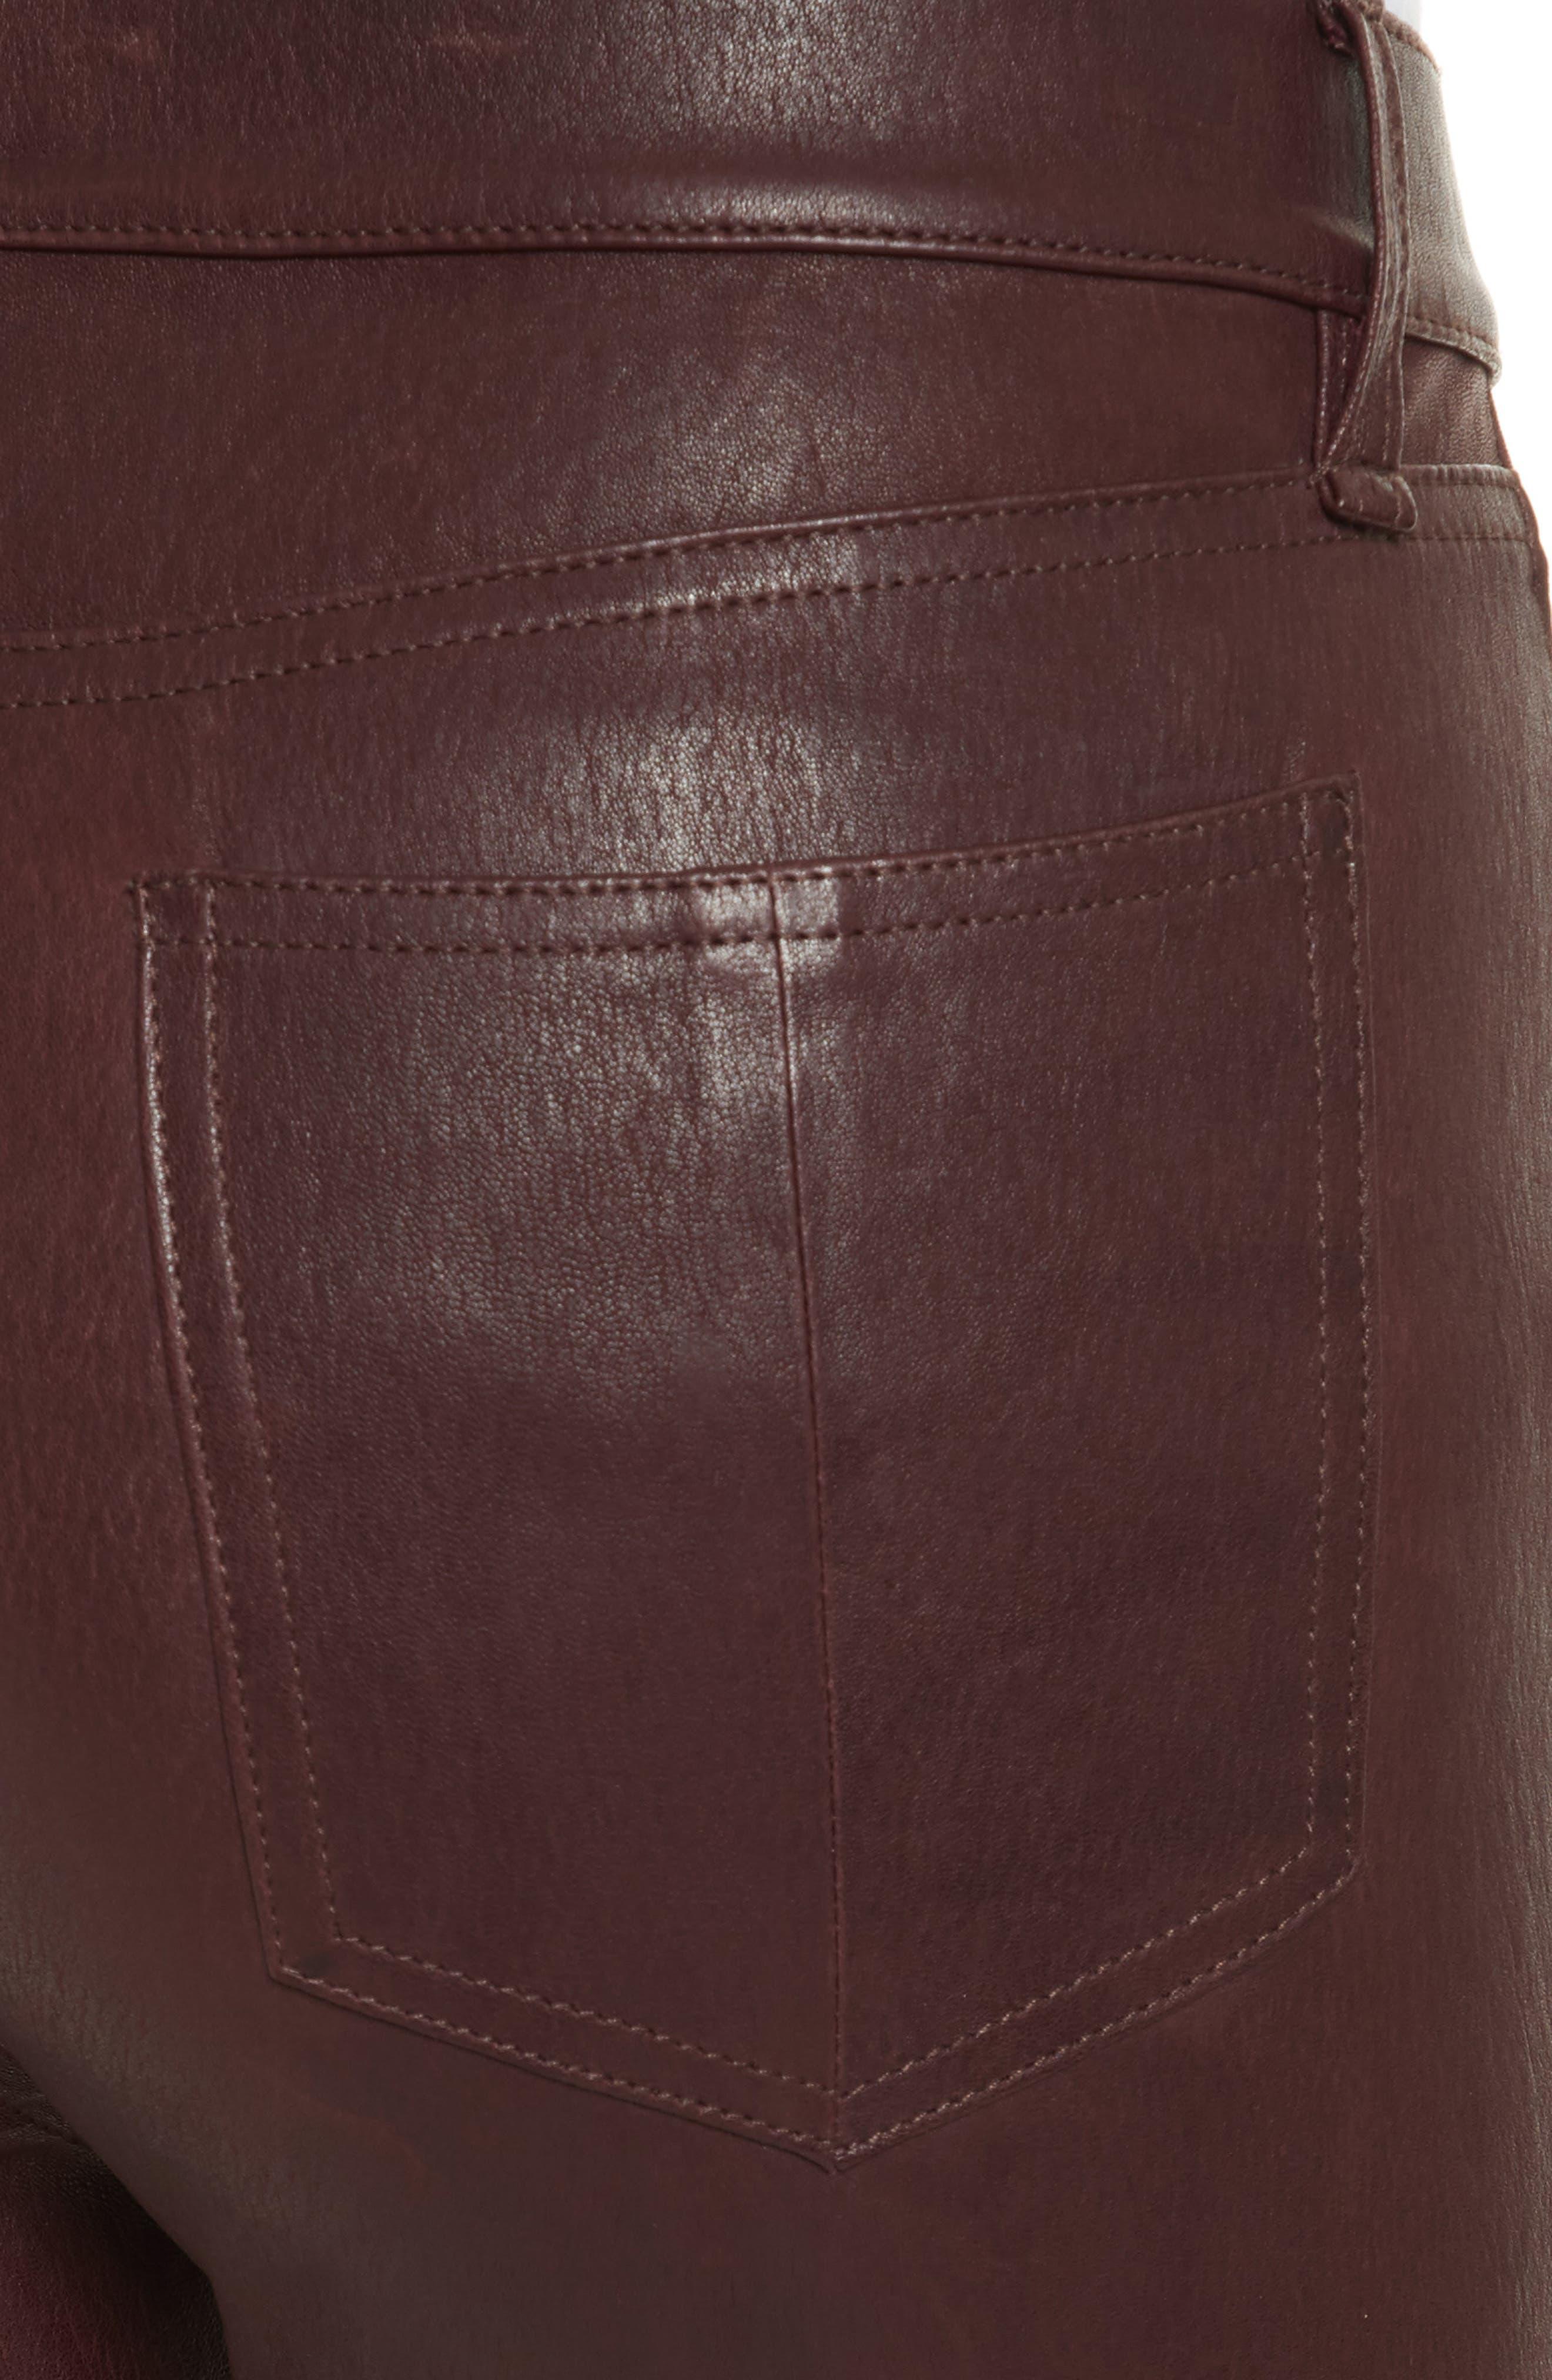 Lambskin Leather Pants,                             Alternate thumbnail 4, color,                             230